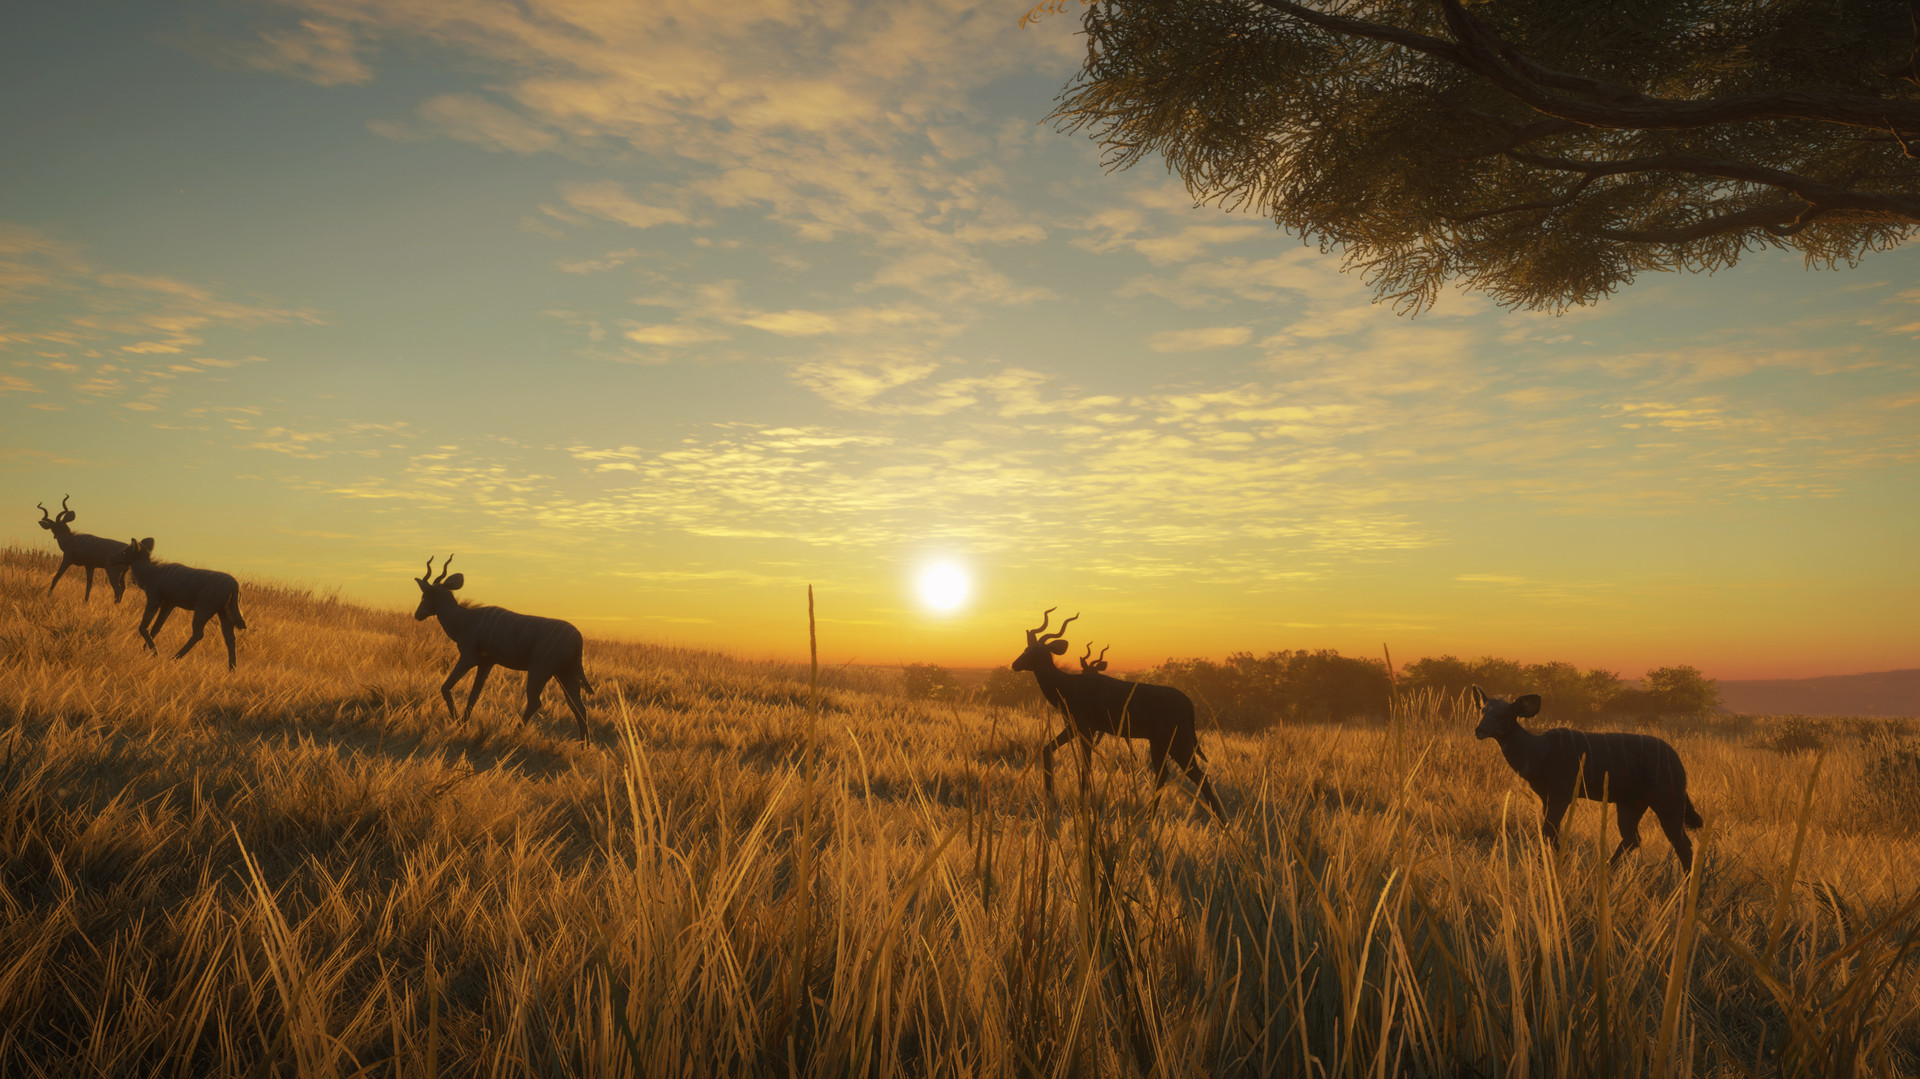 theHunter: Call of the Wild - Vurhonga Savanna Screenshot 3